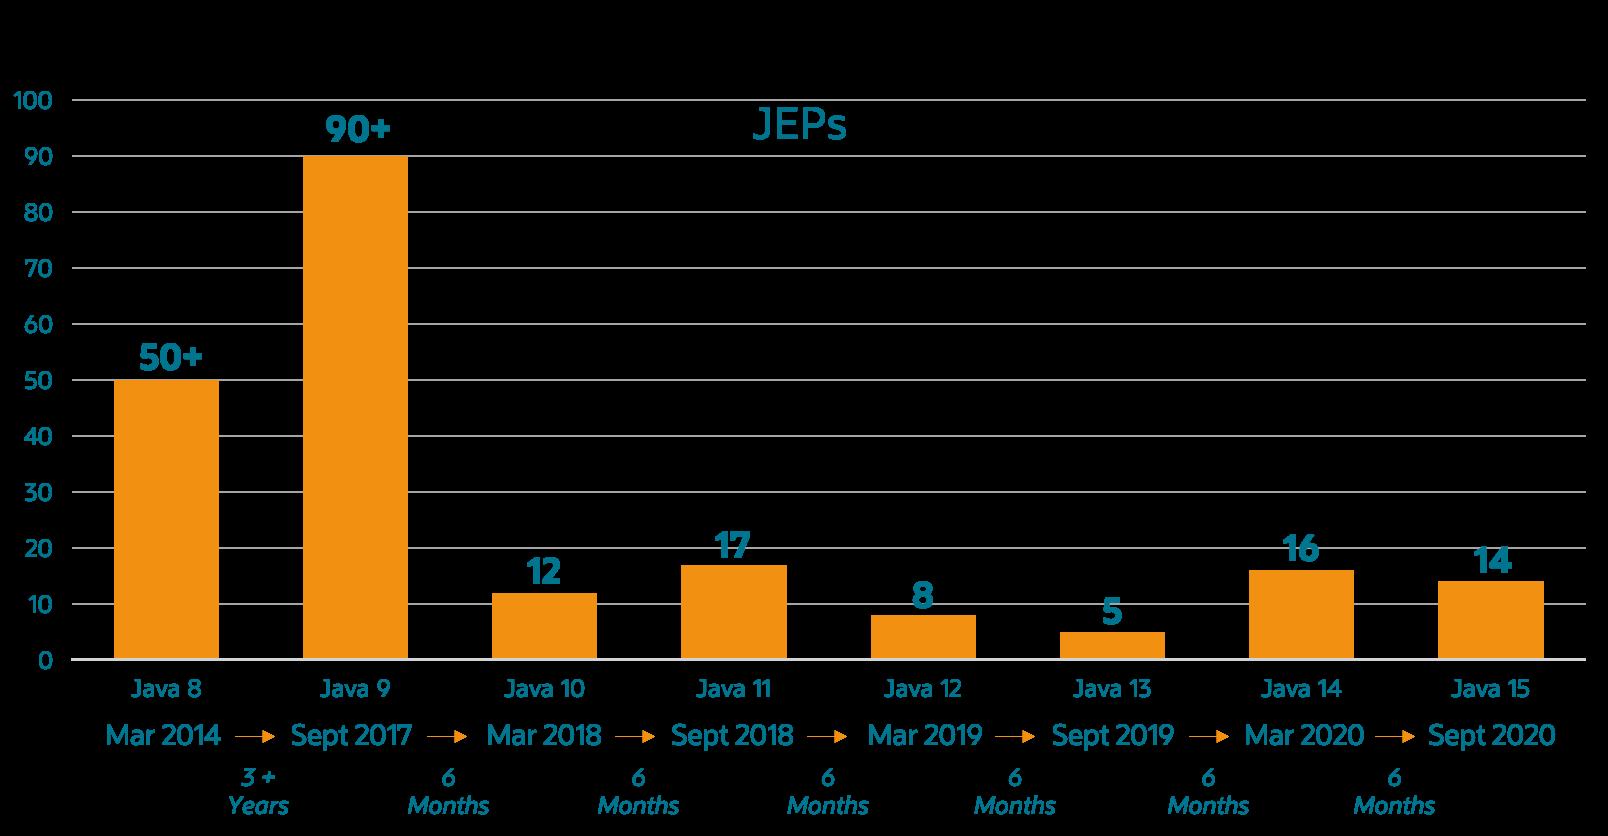 Java JEP数量随着迭代的加速更加容易应对